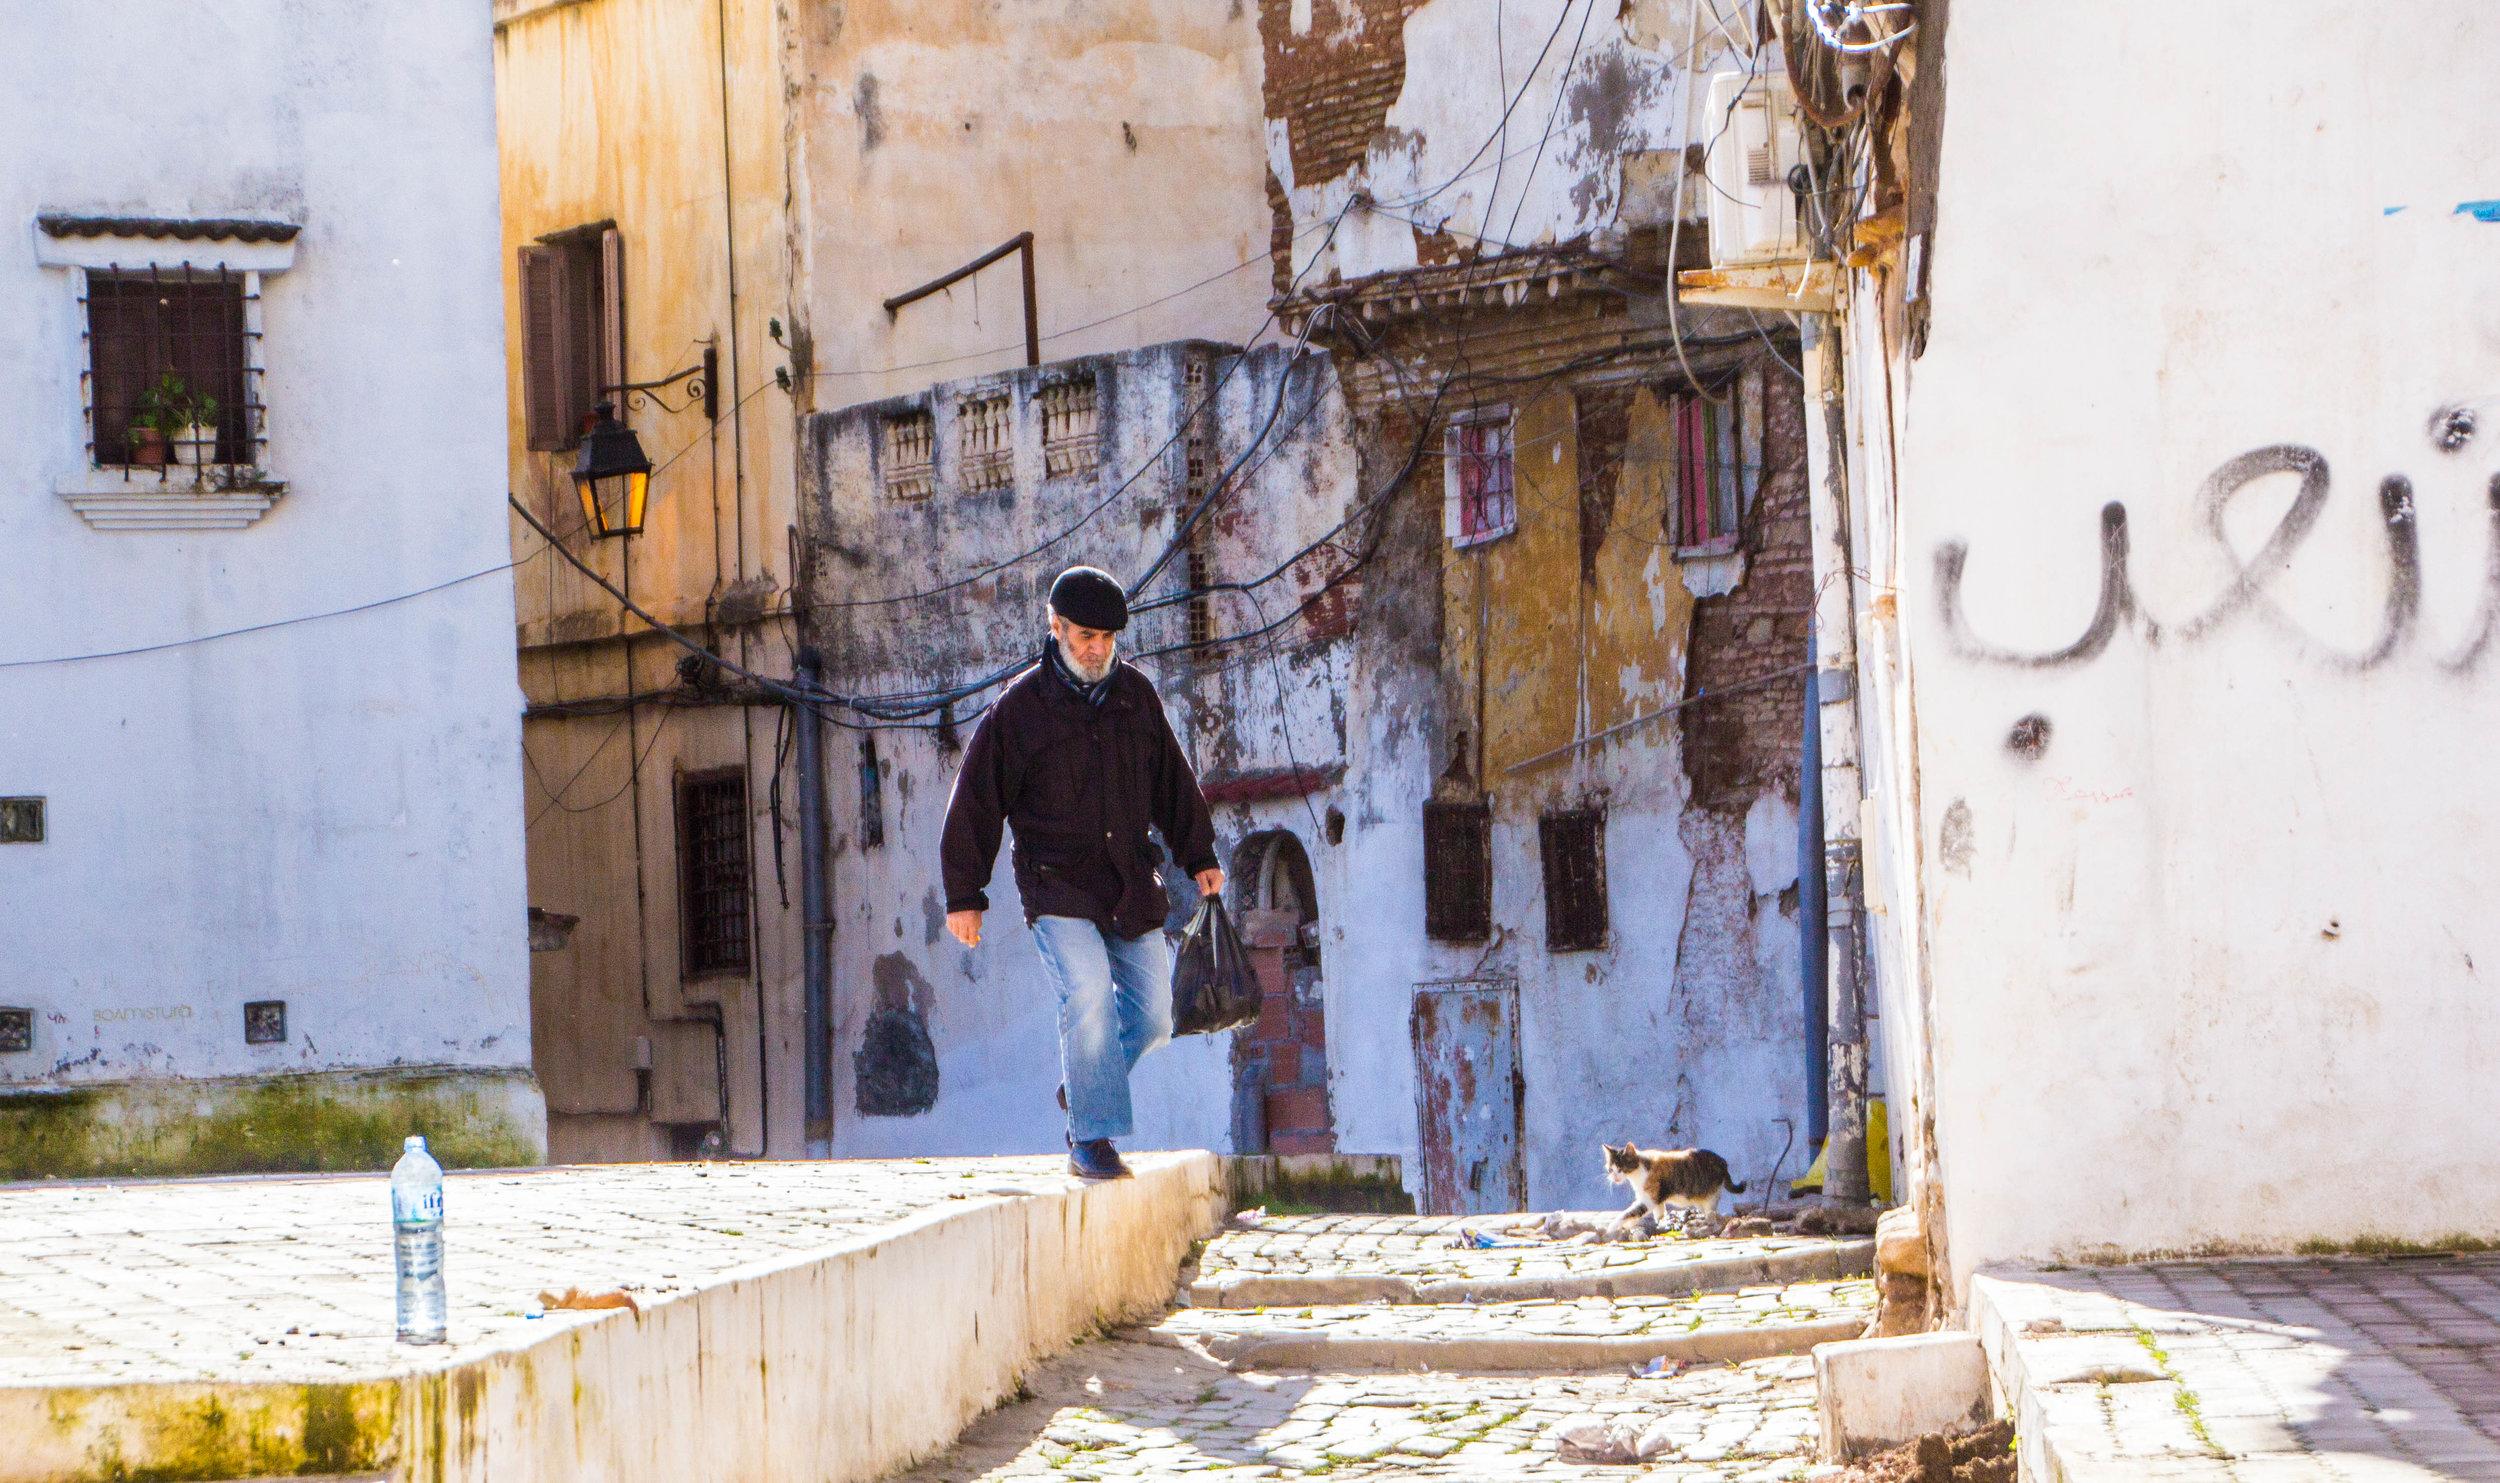 casbah-photography-algiers-algeria-alger-52.jpg